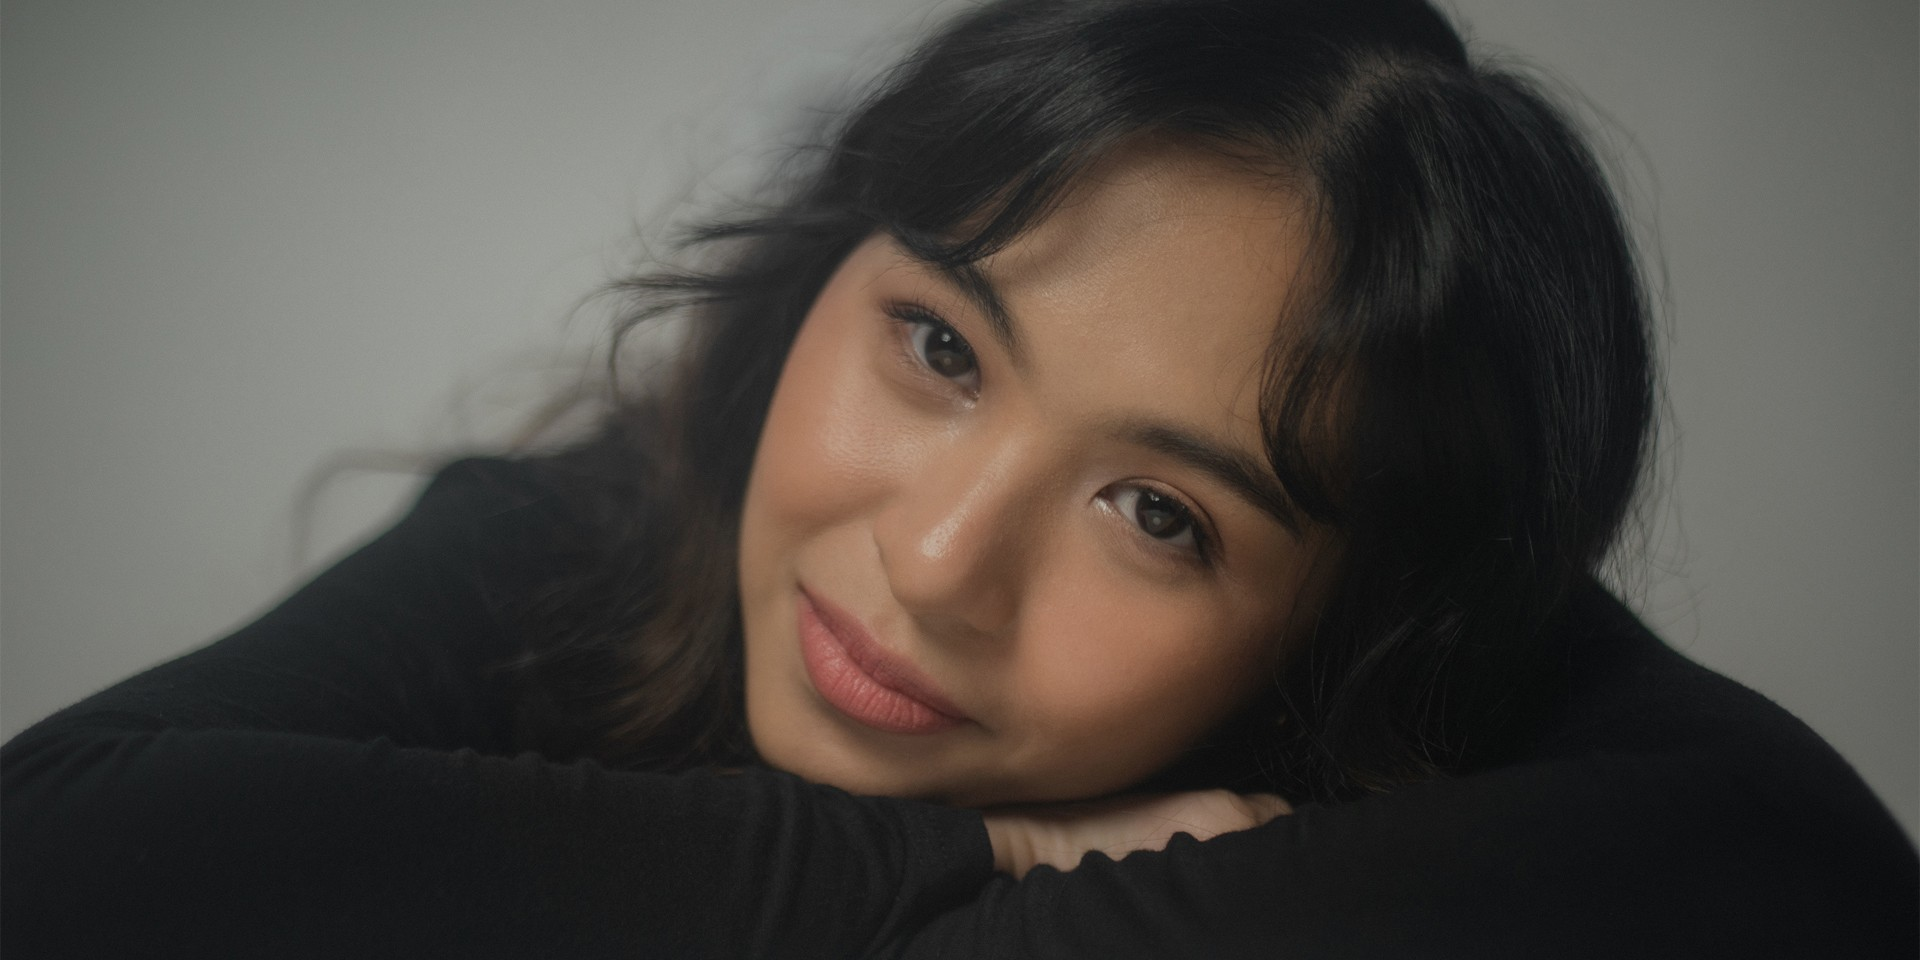 Clara Benin teams up with The Ringmaster and Berto Pah on 'Suara Hati', the Bahasa Indonesia version of 'Tila' – listen